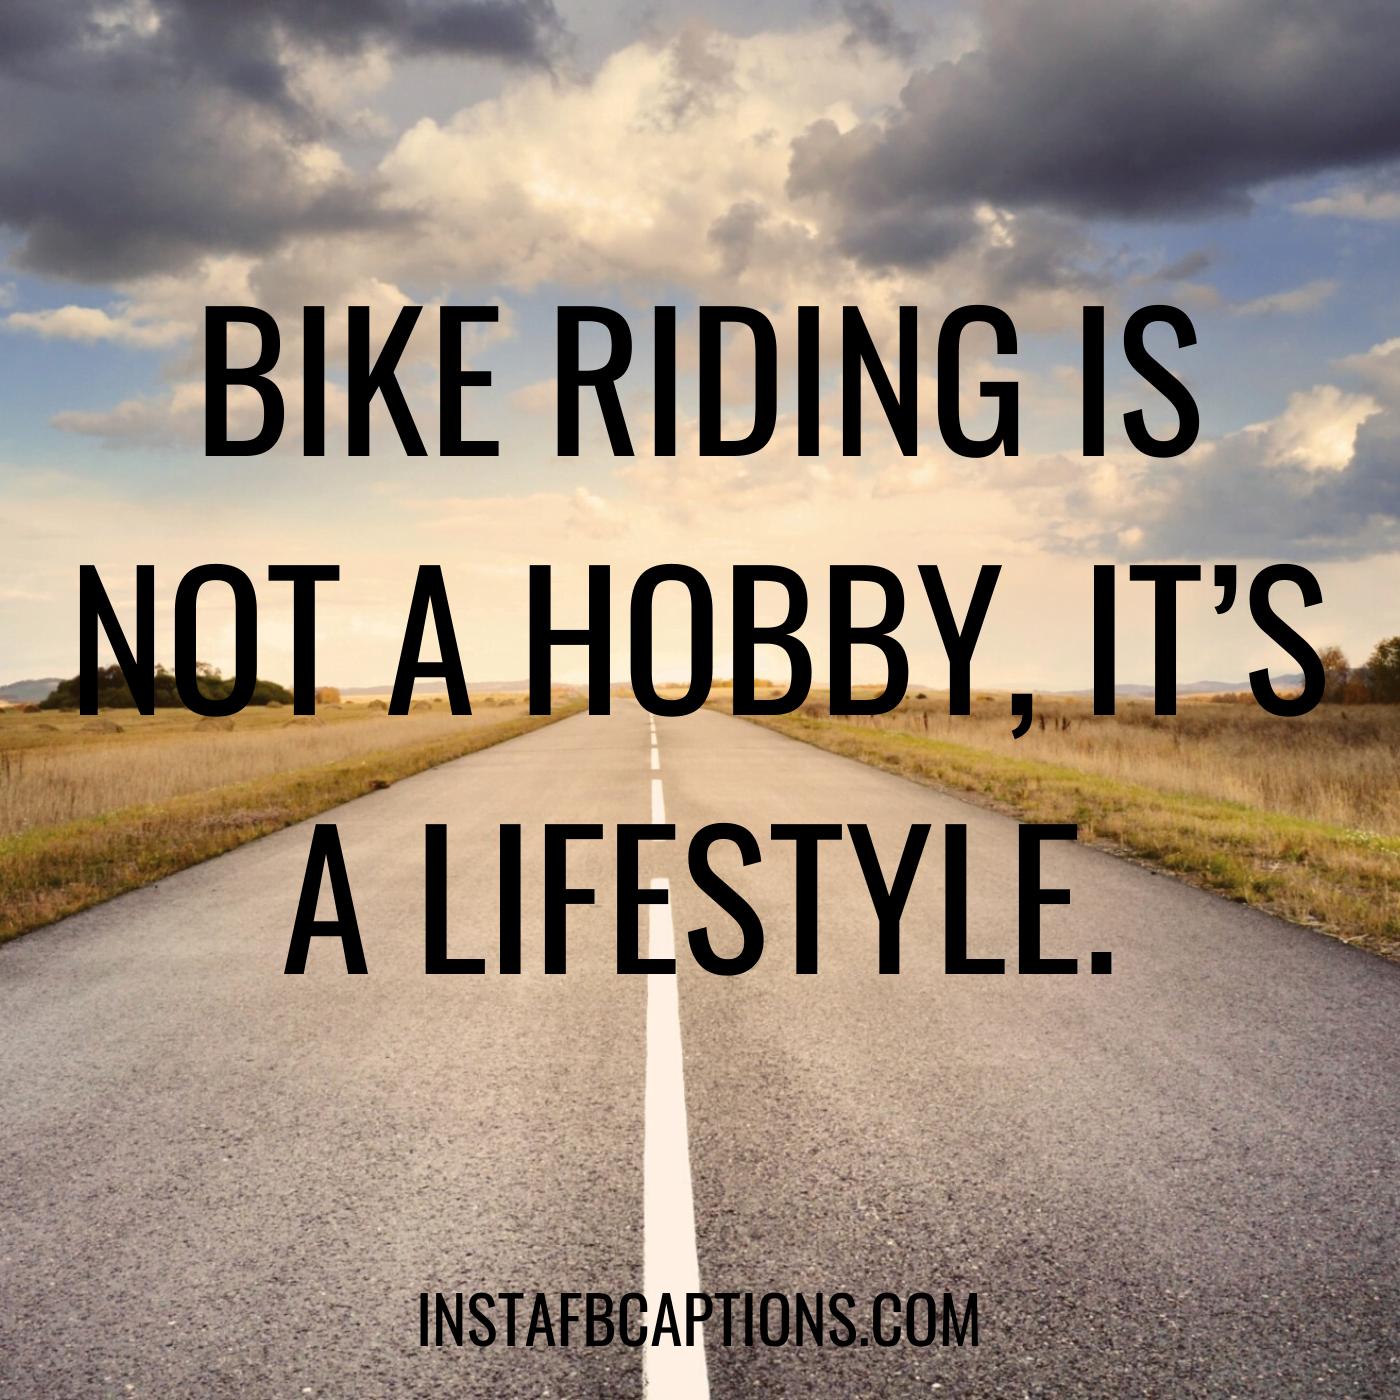 Attitude Captions For All 'bikeaholics'  - Attitude Captions for all Bikeaholics - BIKES Instagram Captions for New Bike Riders in 2021